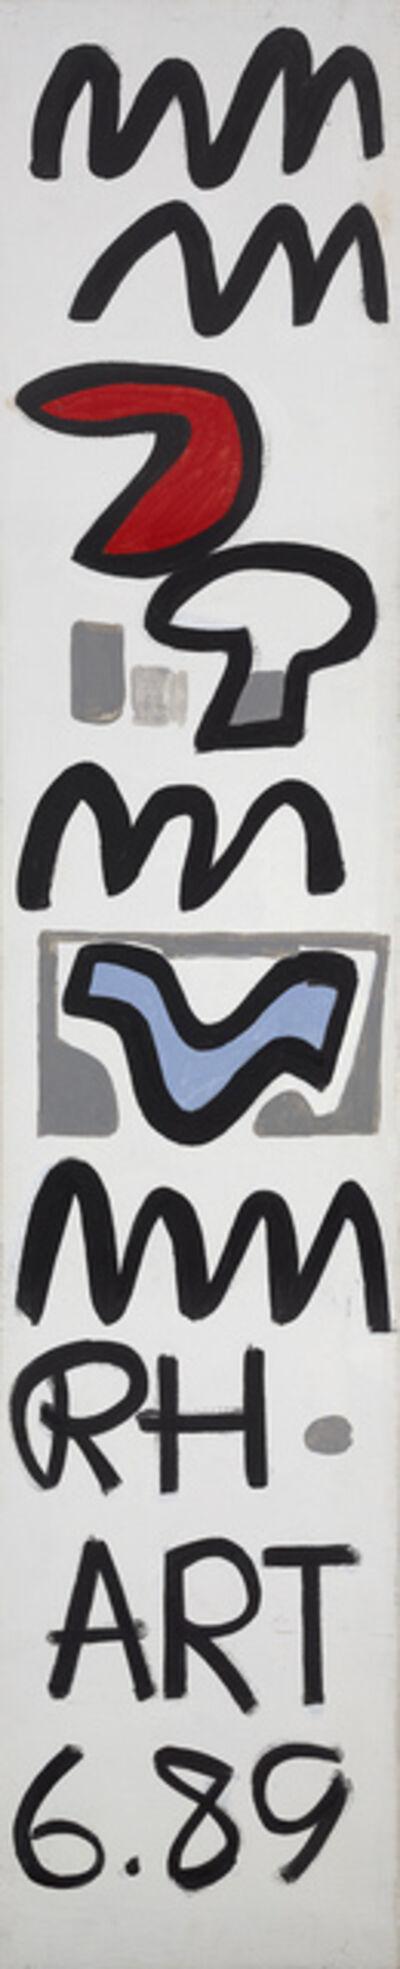 Raymond Hendler, 'RH 6.89', 1989